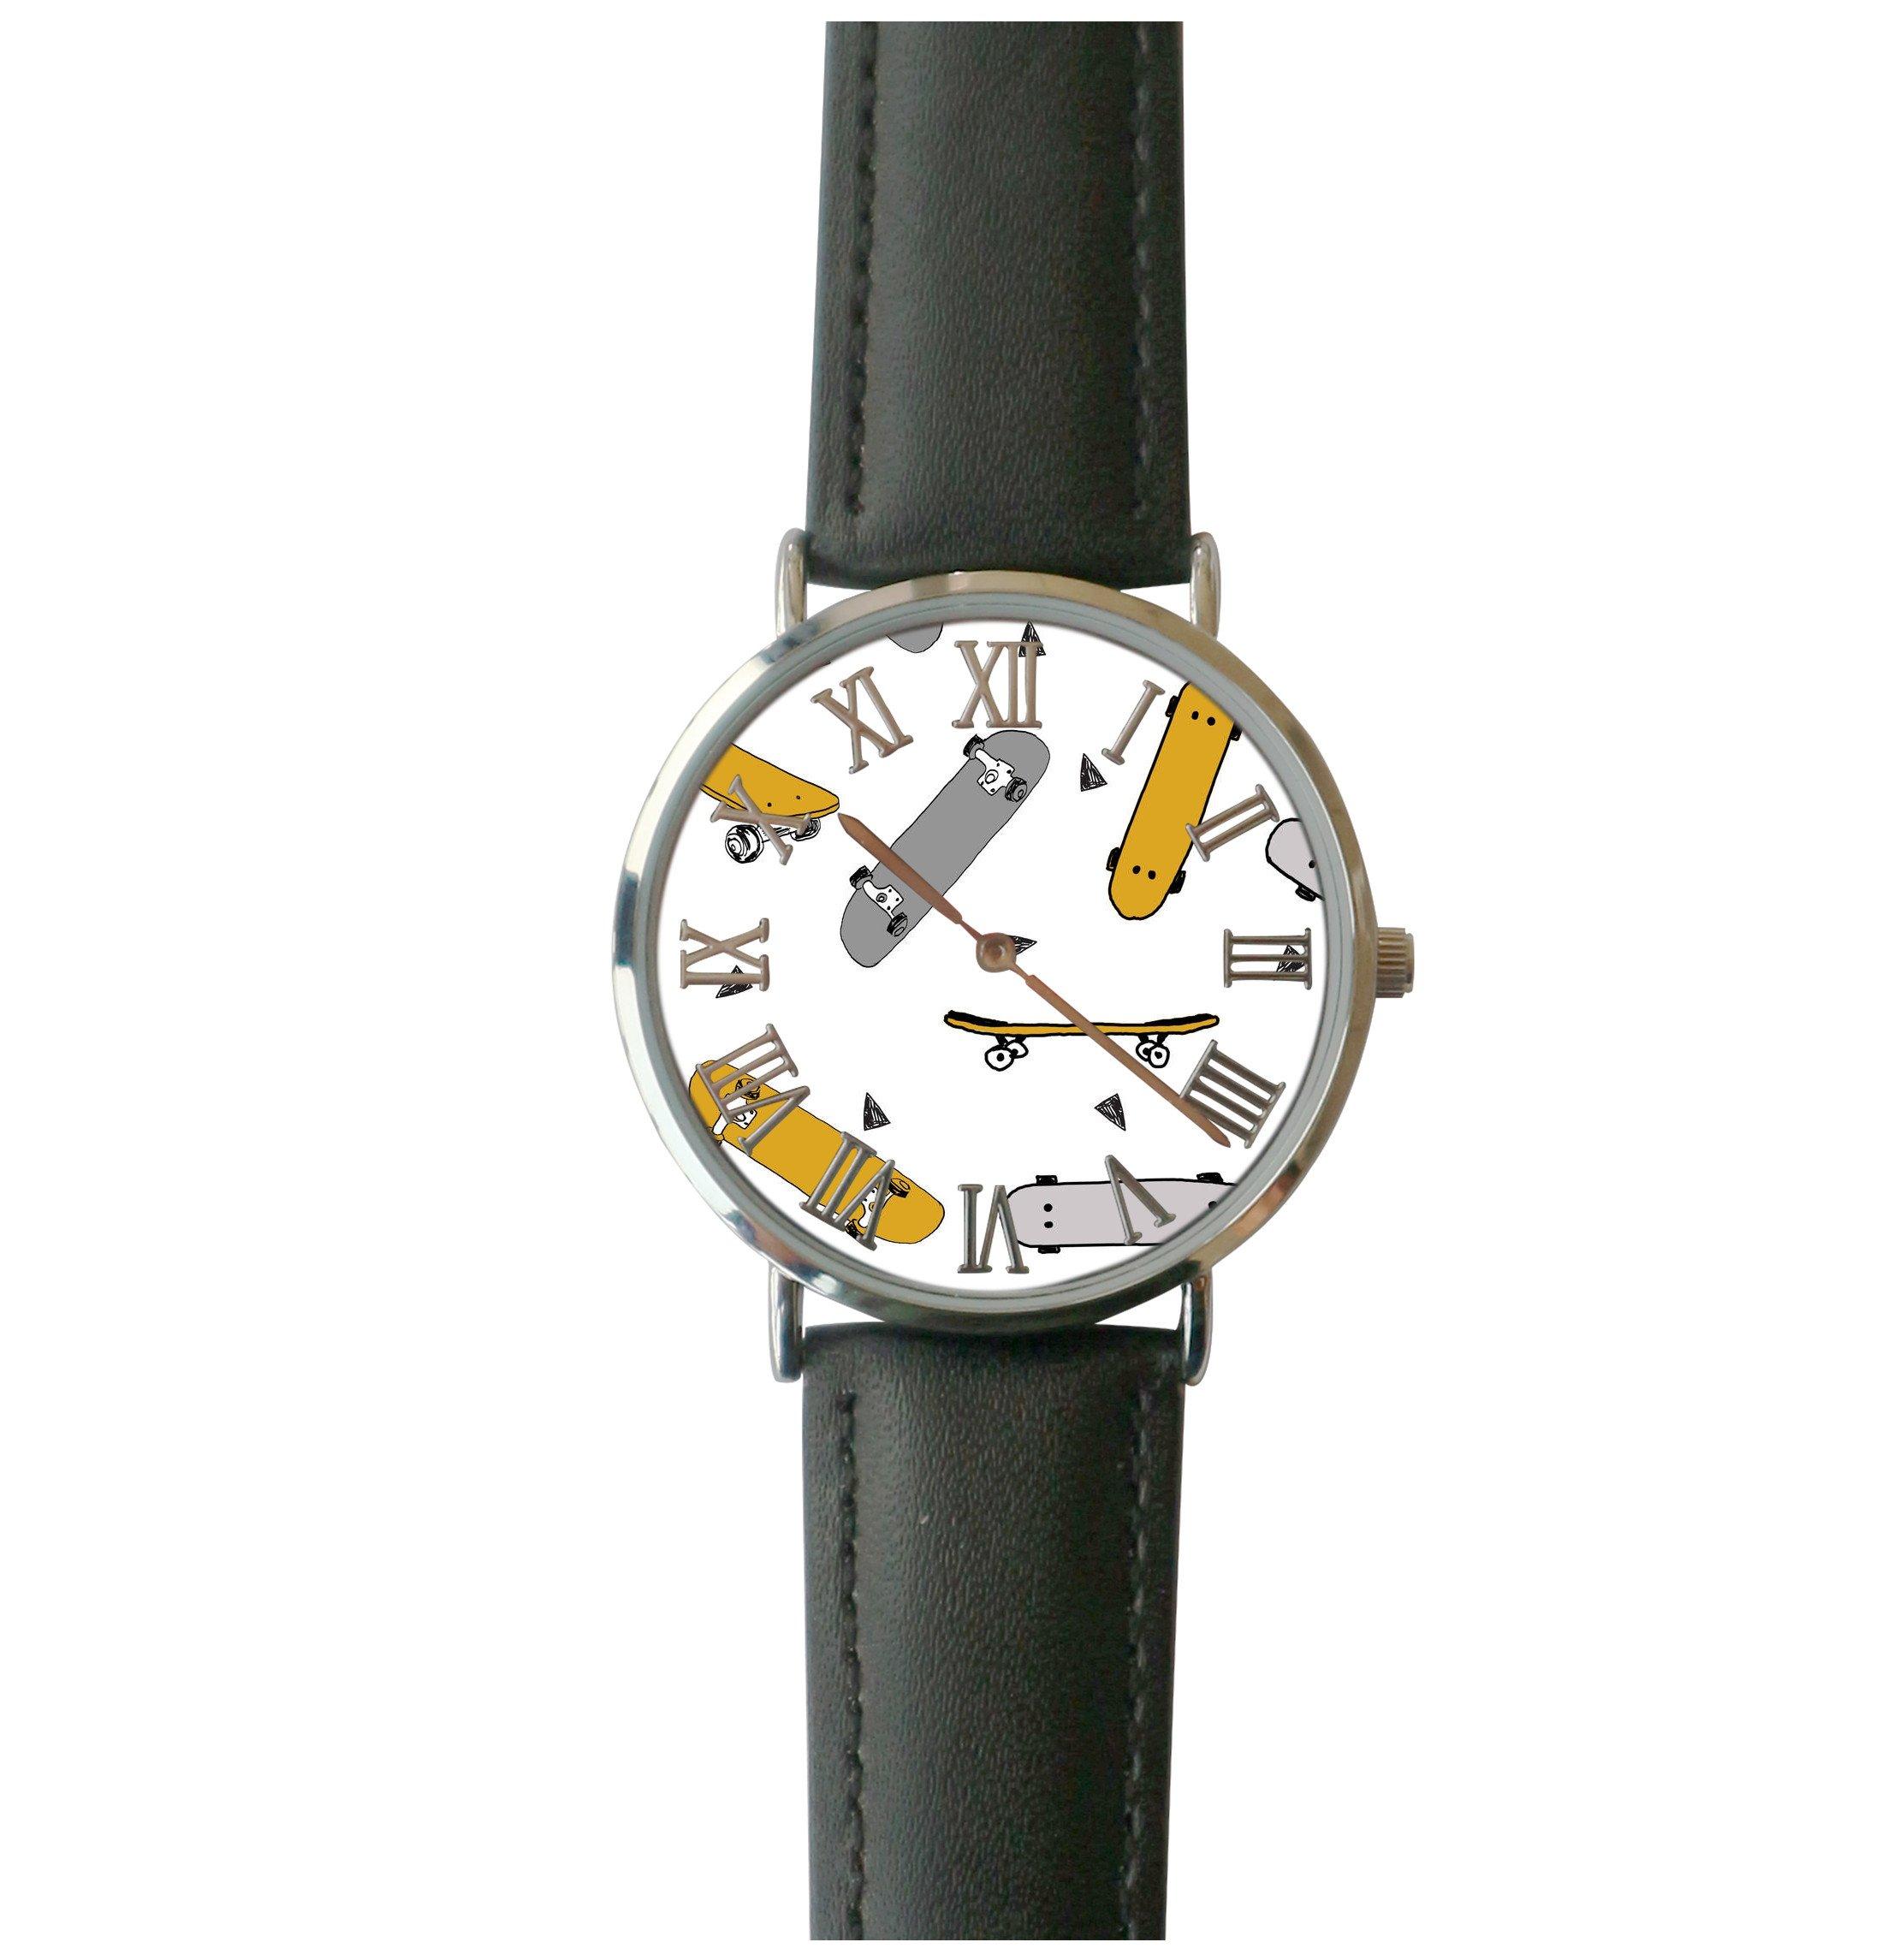 JISJJCKJSX Gray Mustard Skateboard custom watches quartz watch stainless steel case